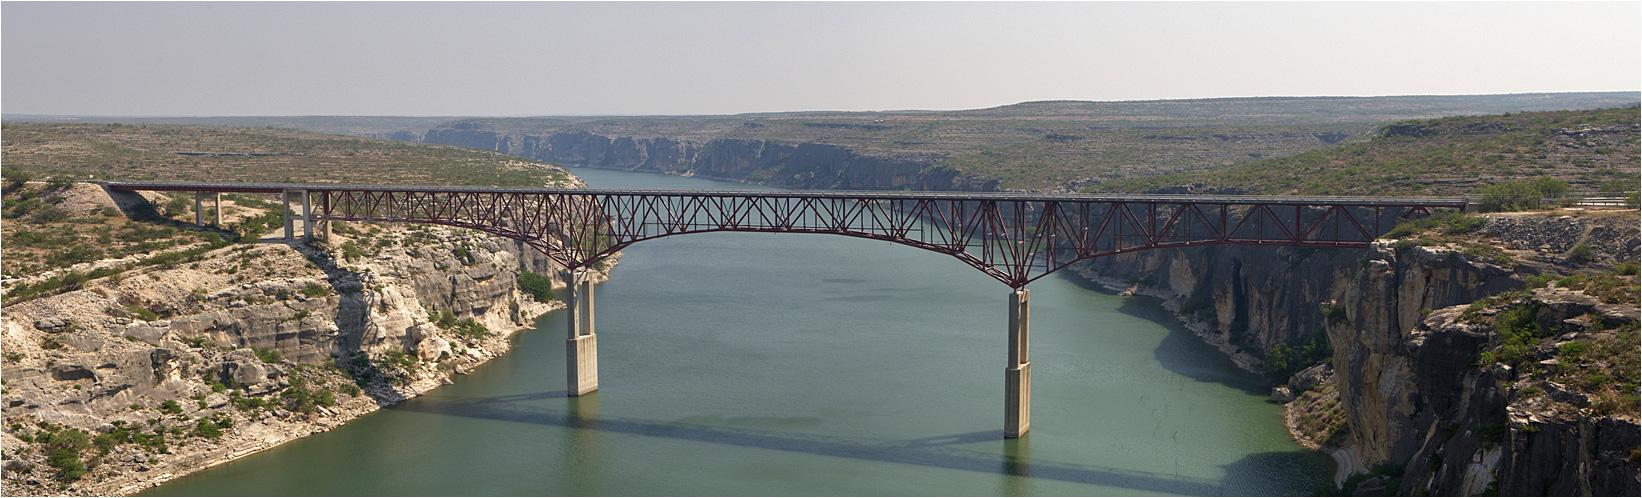 [ high bridge ]